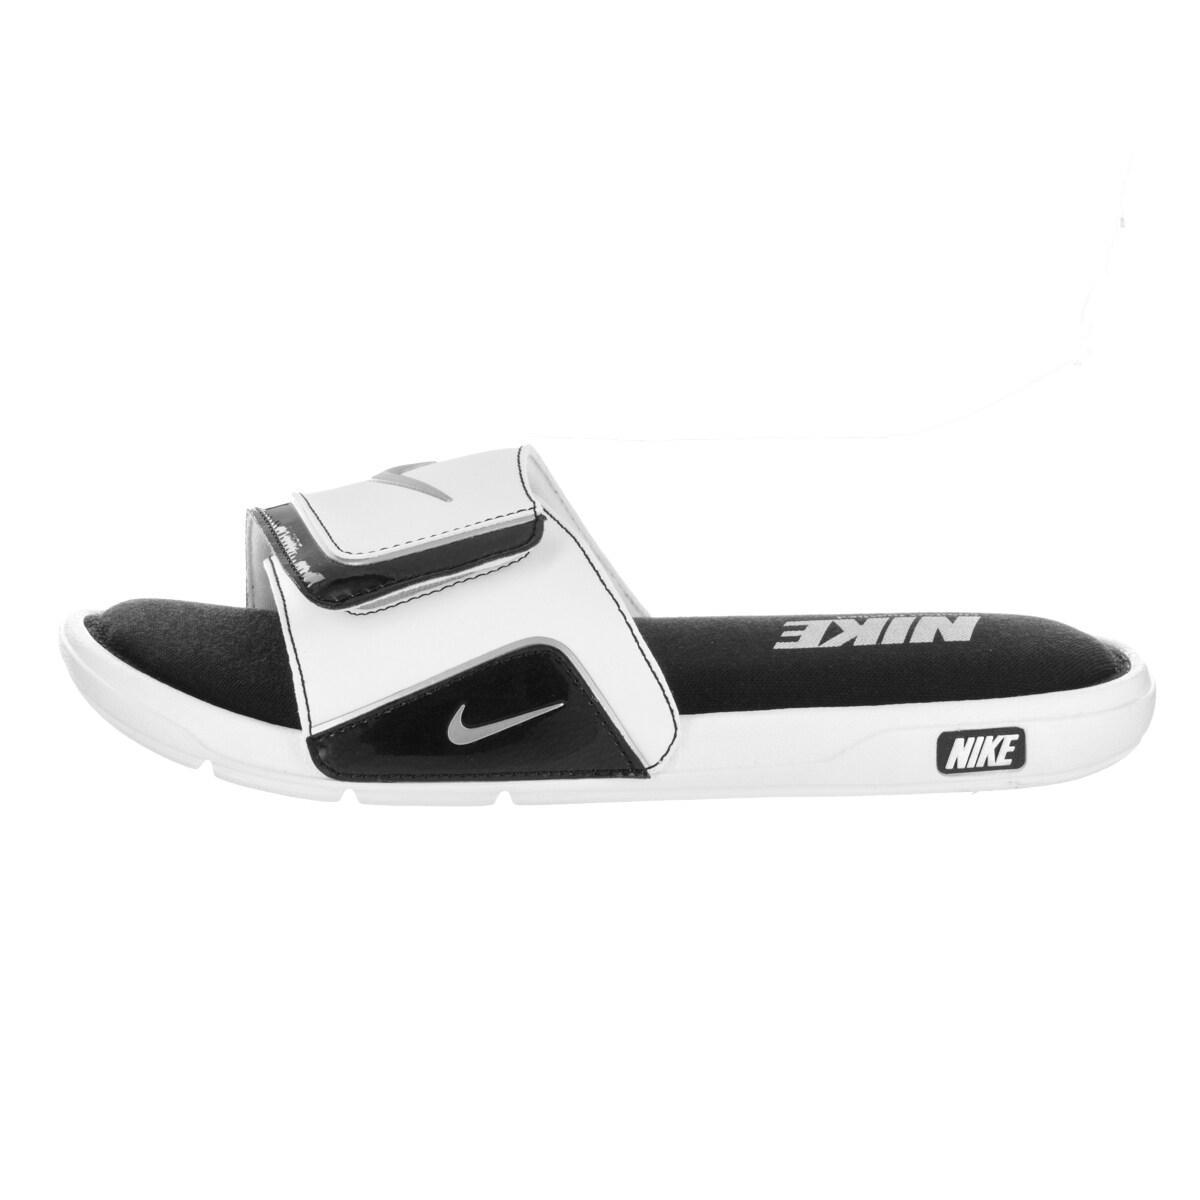 brand new 38492 bee3c Shop Nike Men's Comfort Slide 2 Sandal - Free Shipping Today - Overstock -  13478254